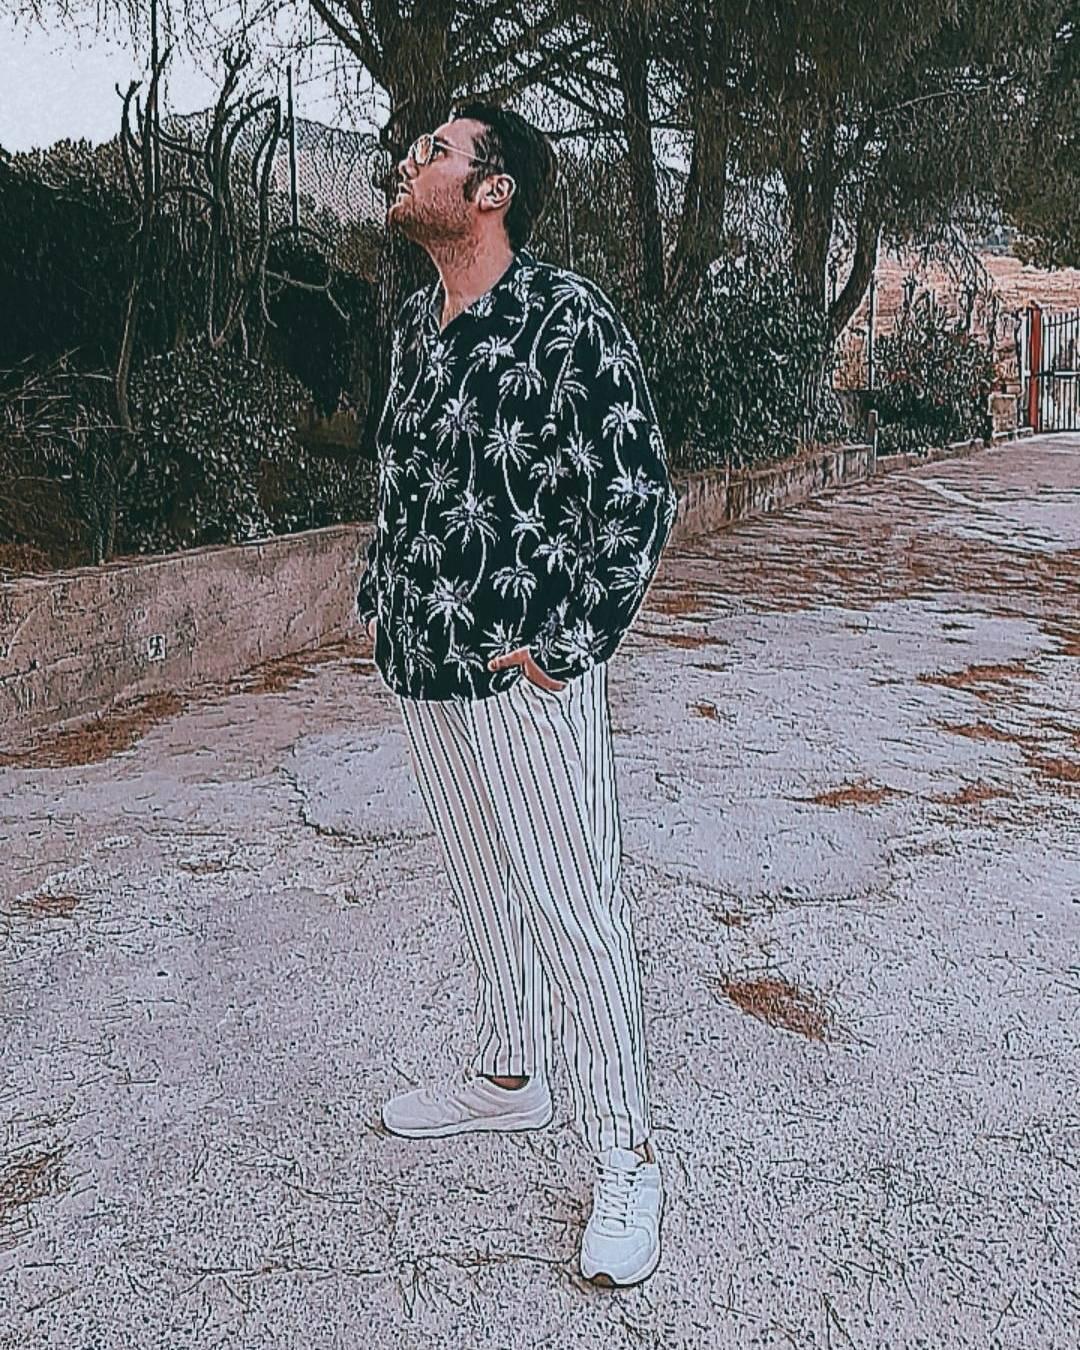 Solo Per Brand! Instagram 43k follower